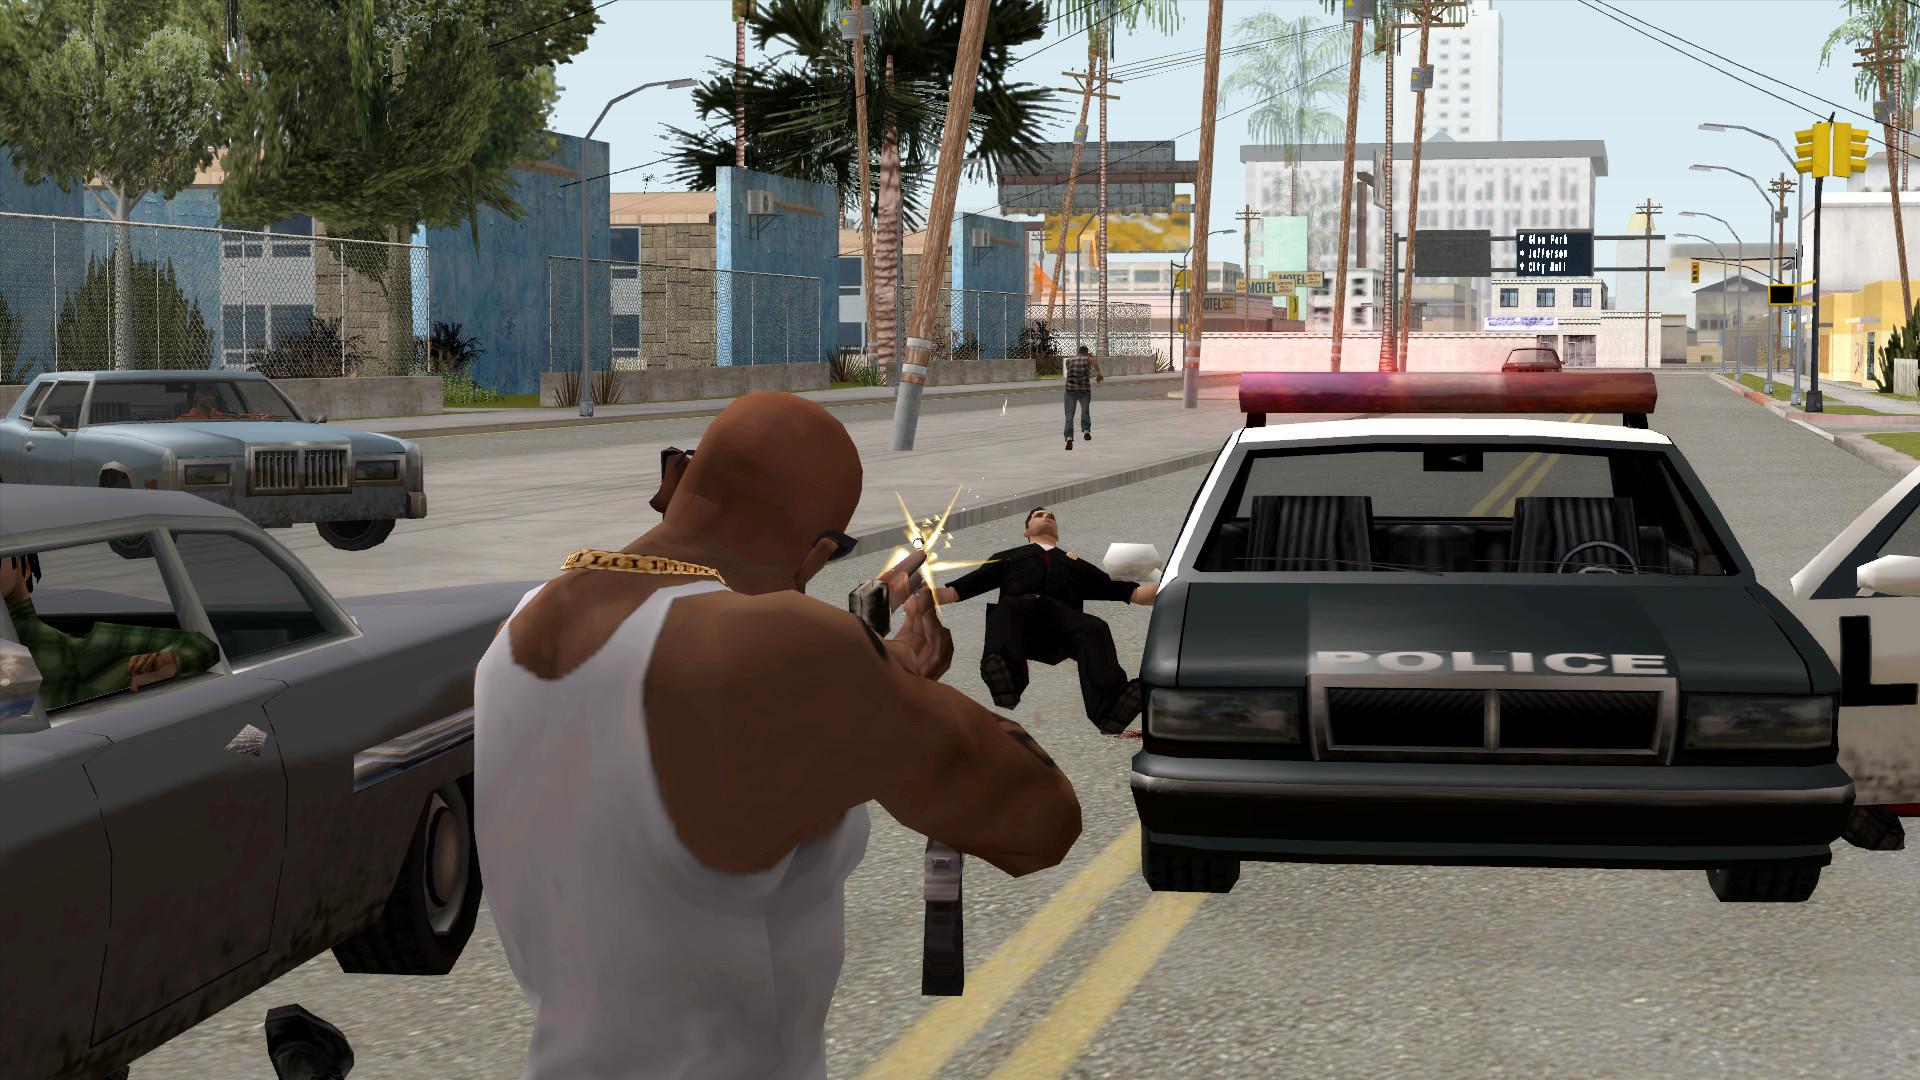 gta_sa 2016-05-10 15-37-56-01.jpg - Grand Theft Auto: San Andreas